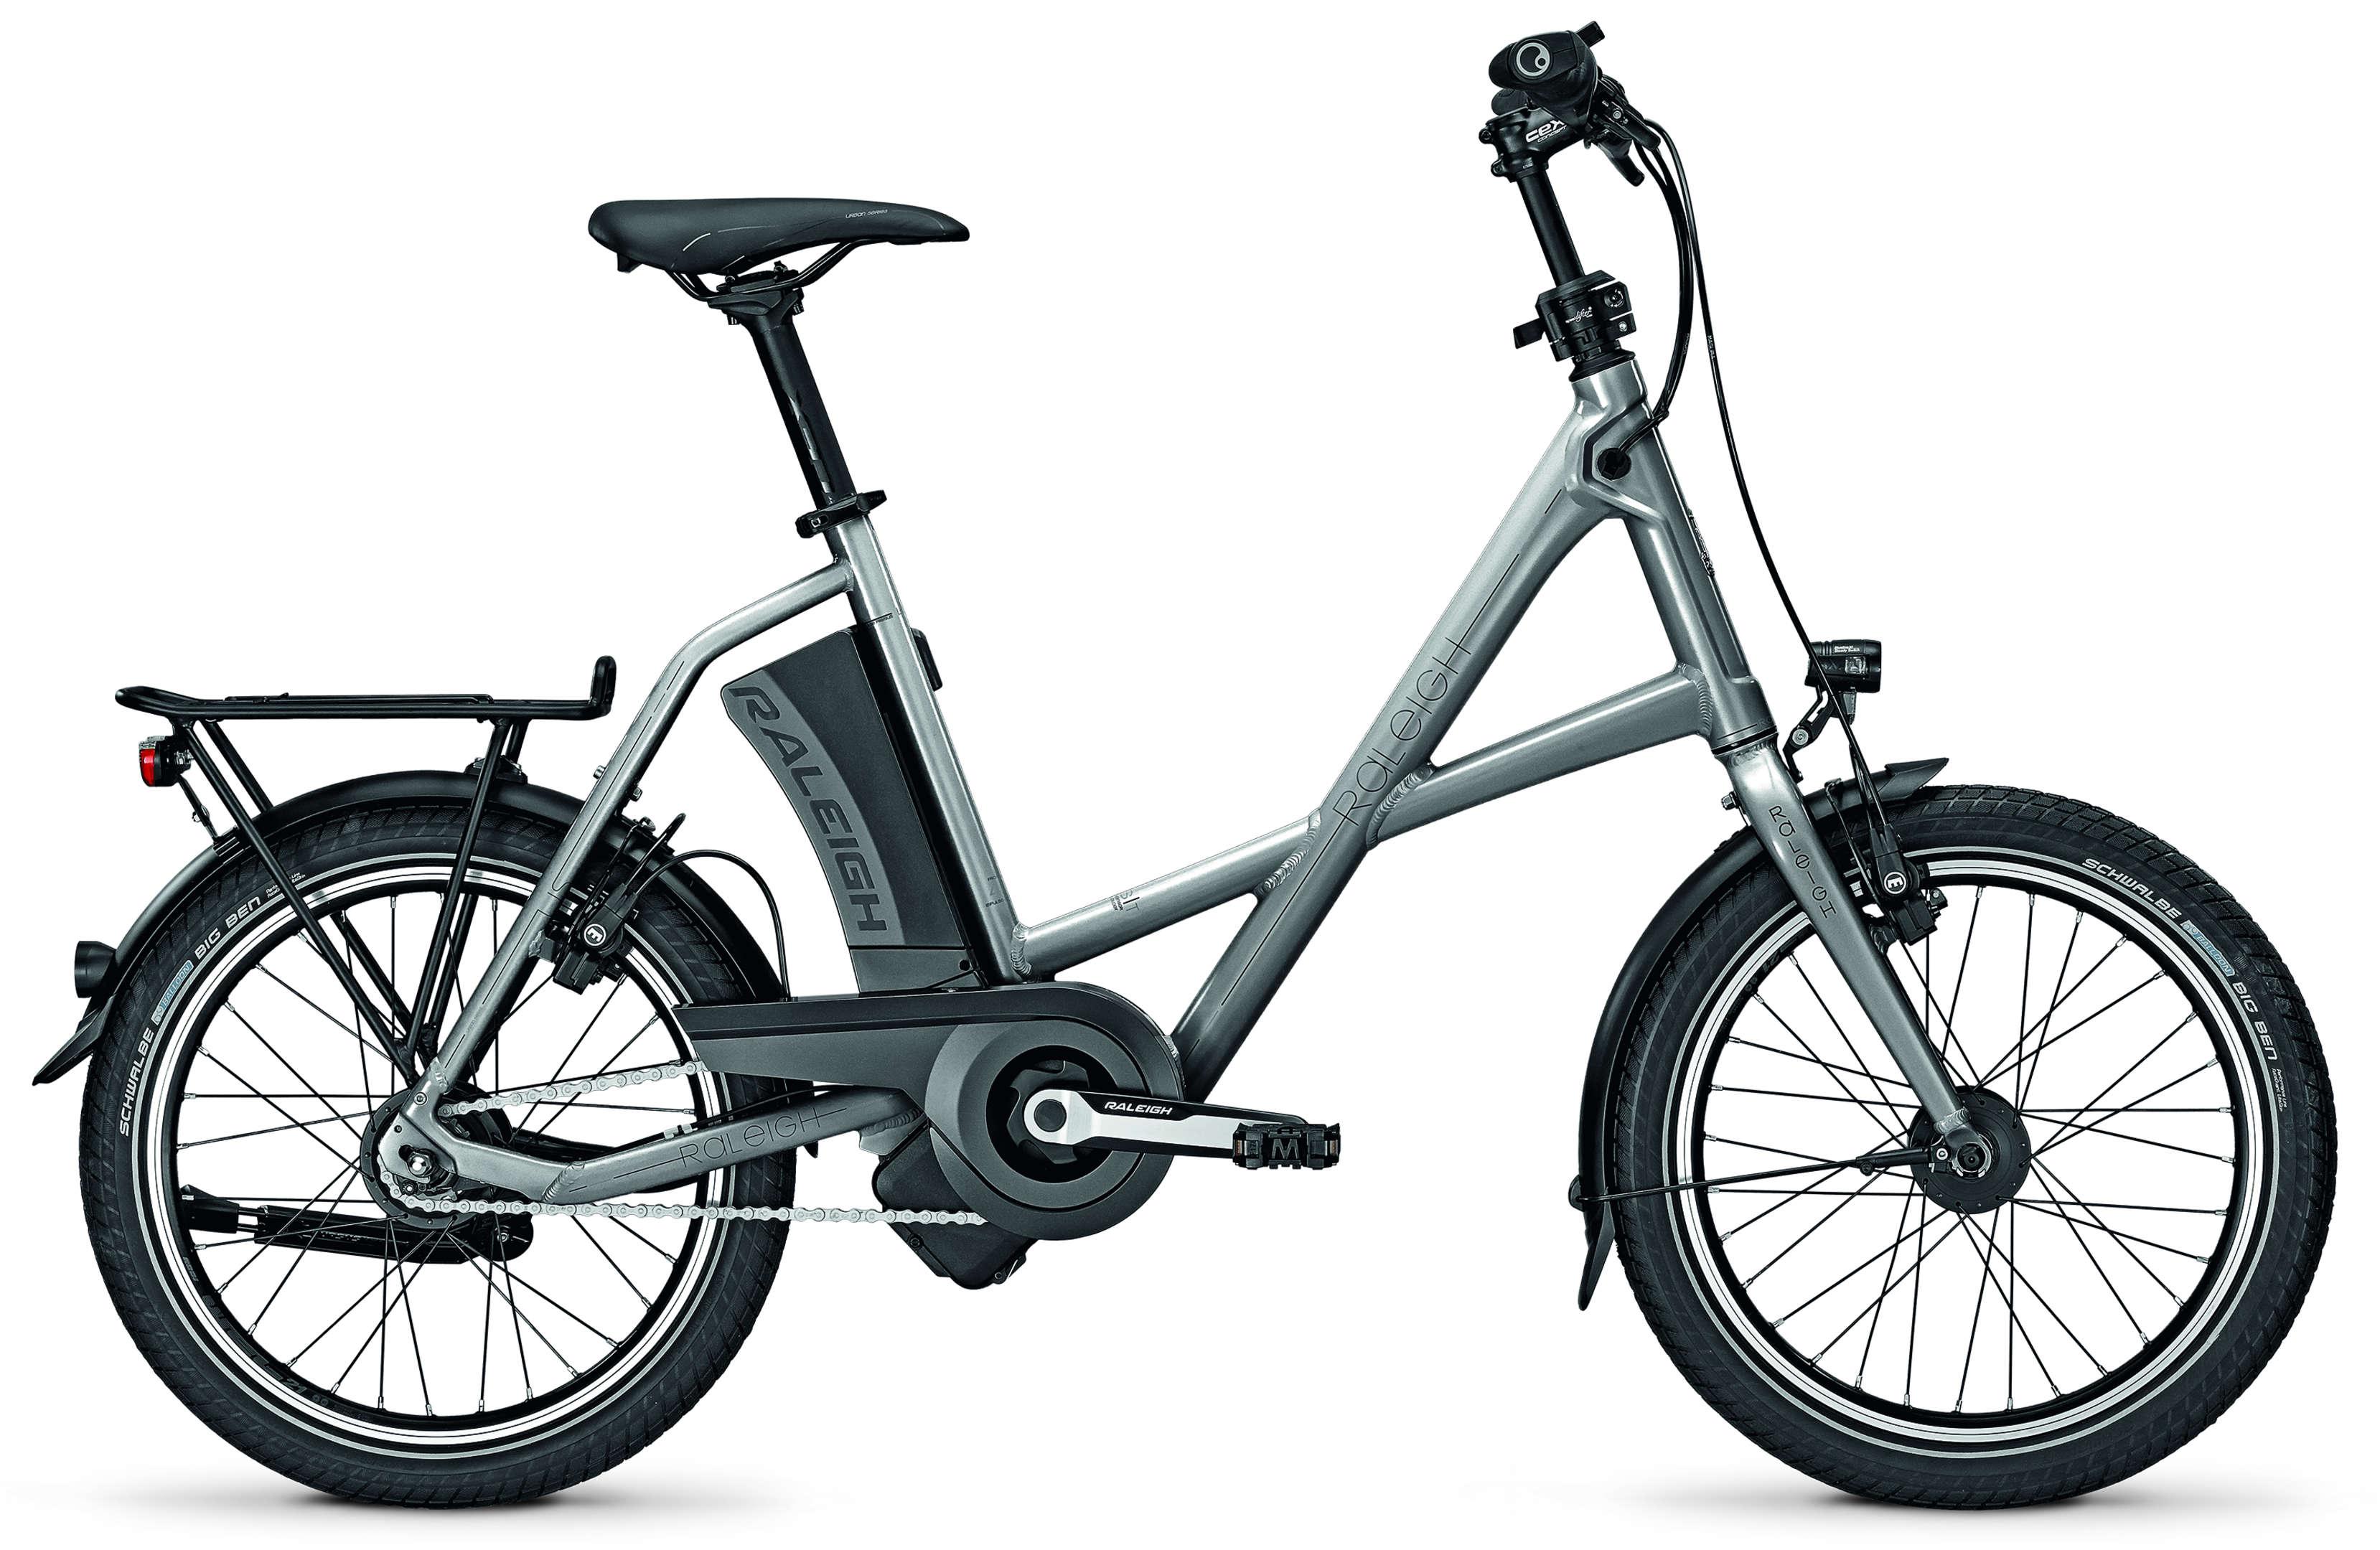 raleigh e bike leeds r compact 8g 14 5ah 36v eurorad. Black Bedroom Furniture Sets. Home Design Ideas